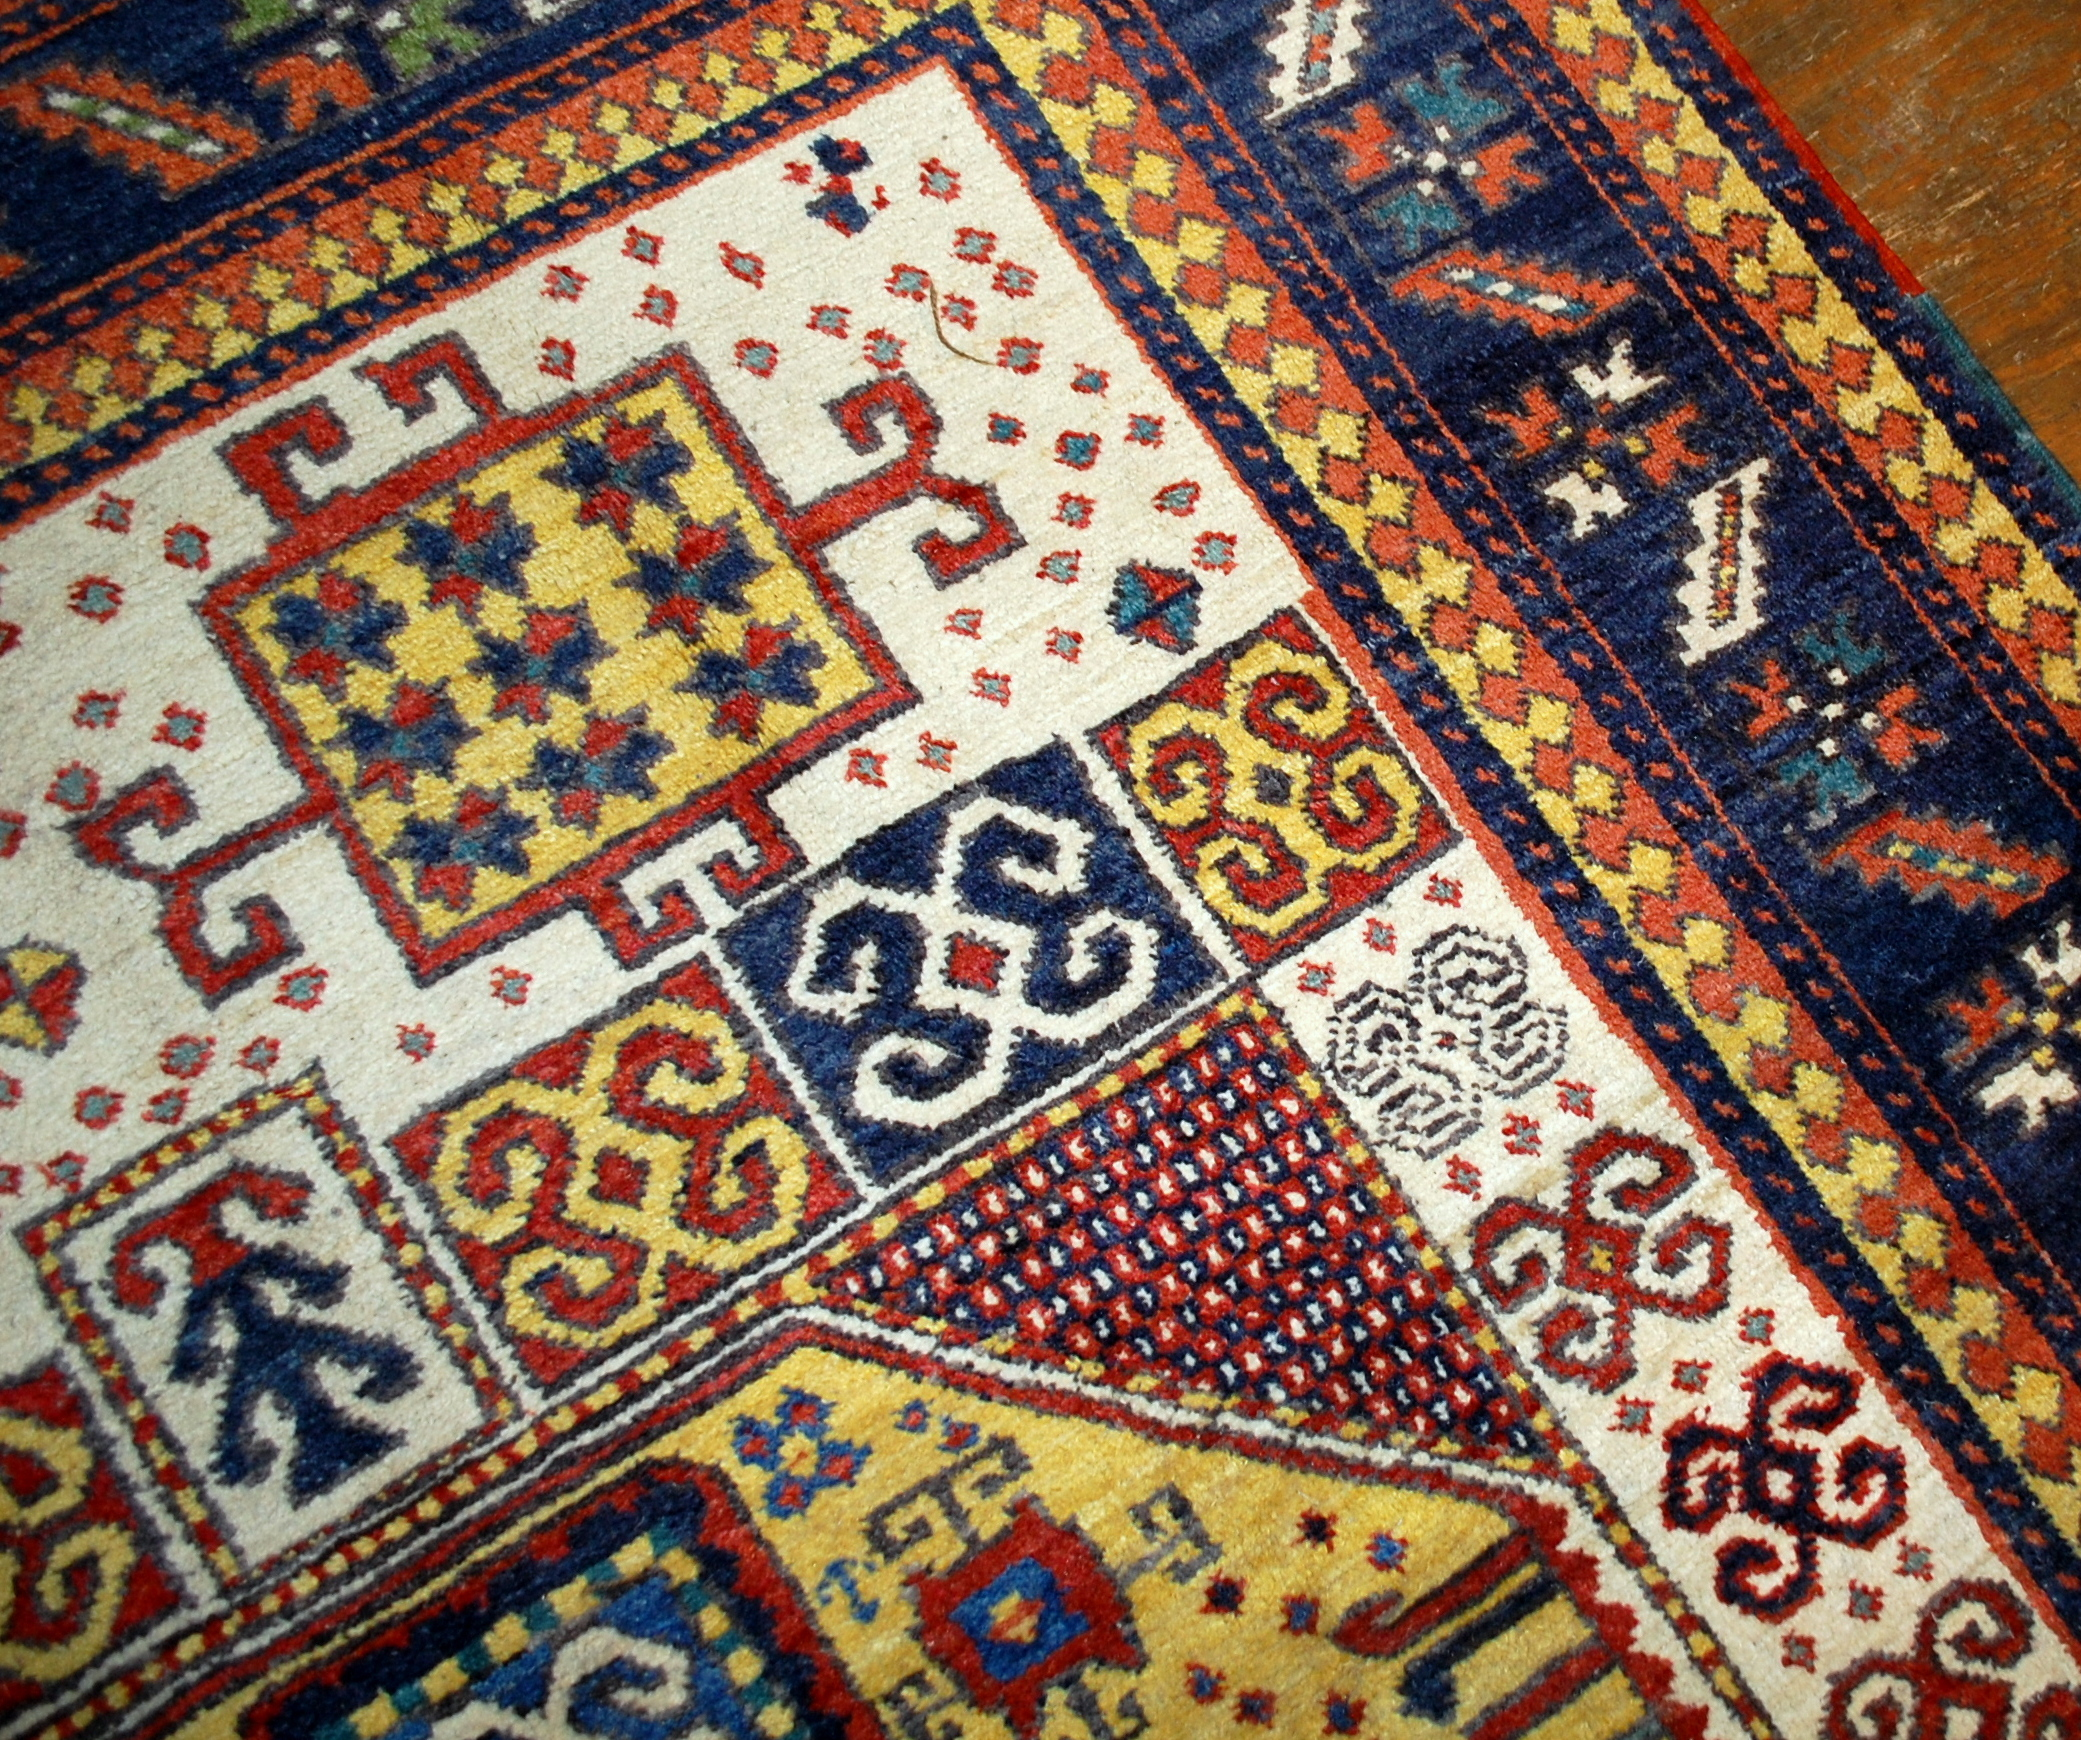 Handmade antique Caucasian Kazak Karachov rug 5.9' x 7.9' ( 180cm x 241cm ) 1940